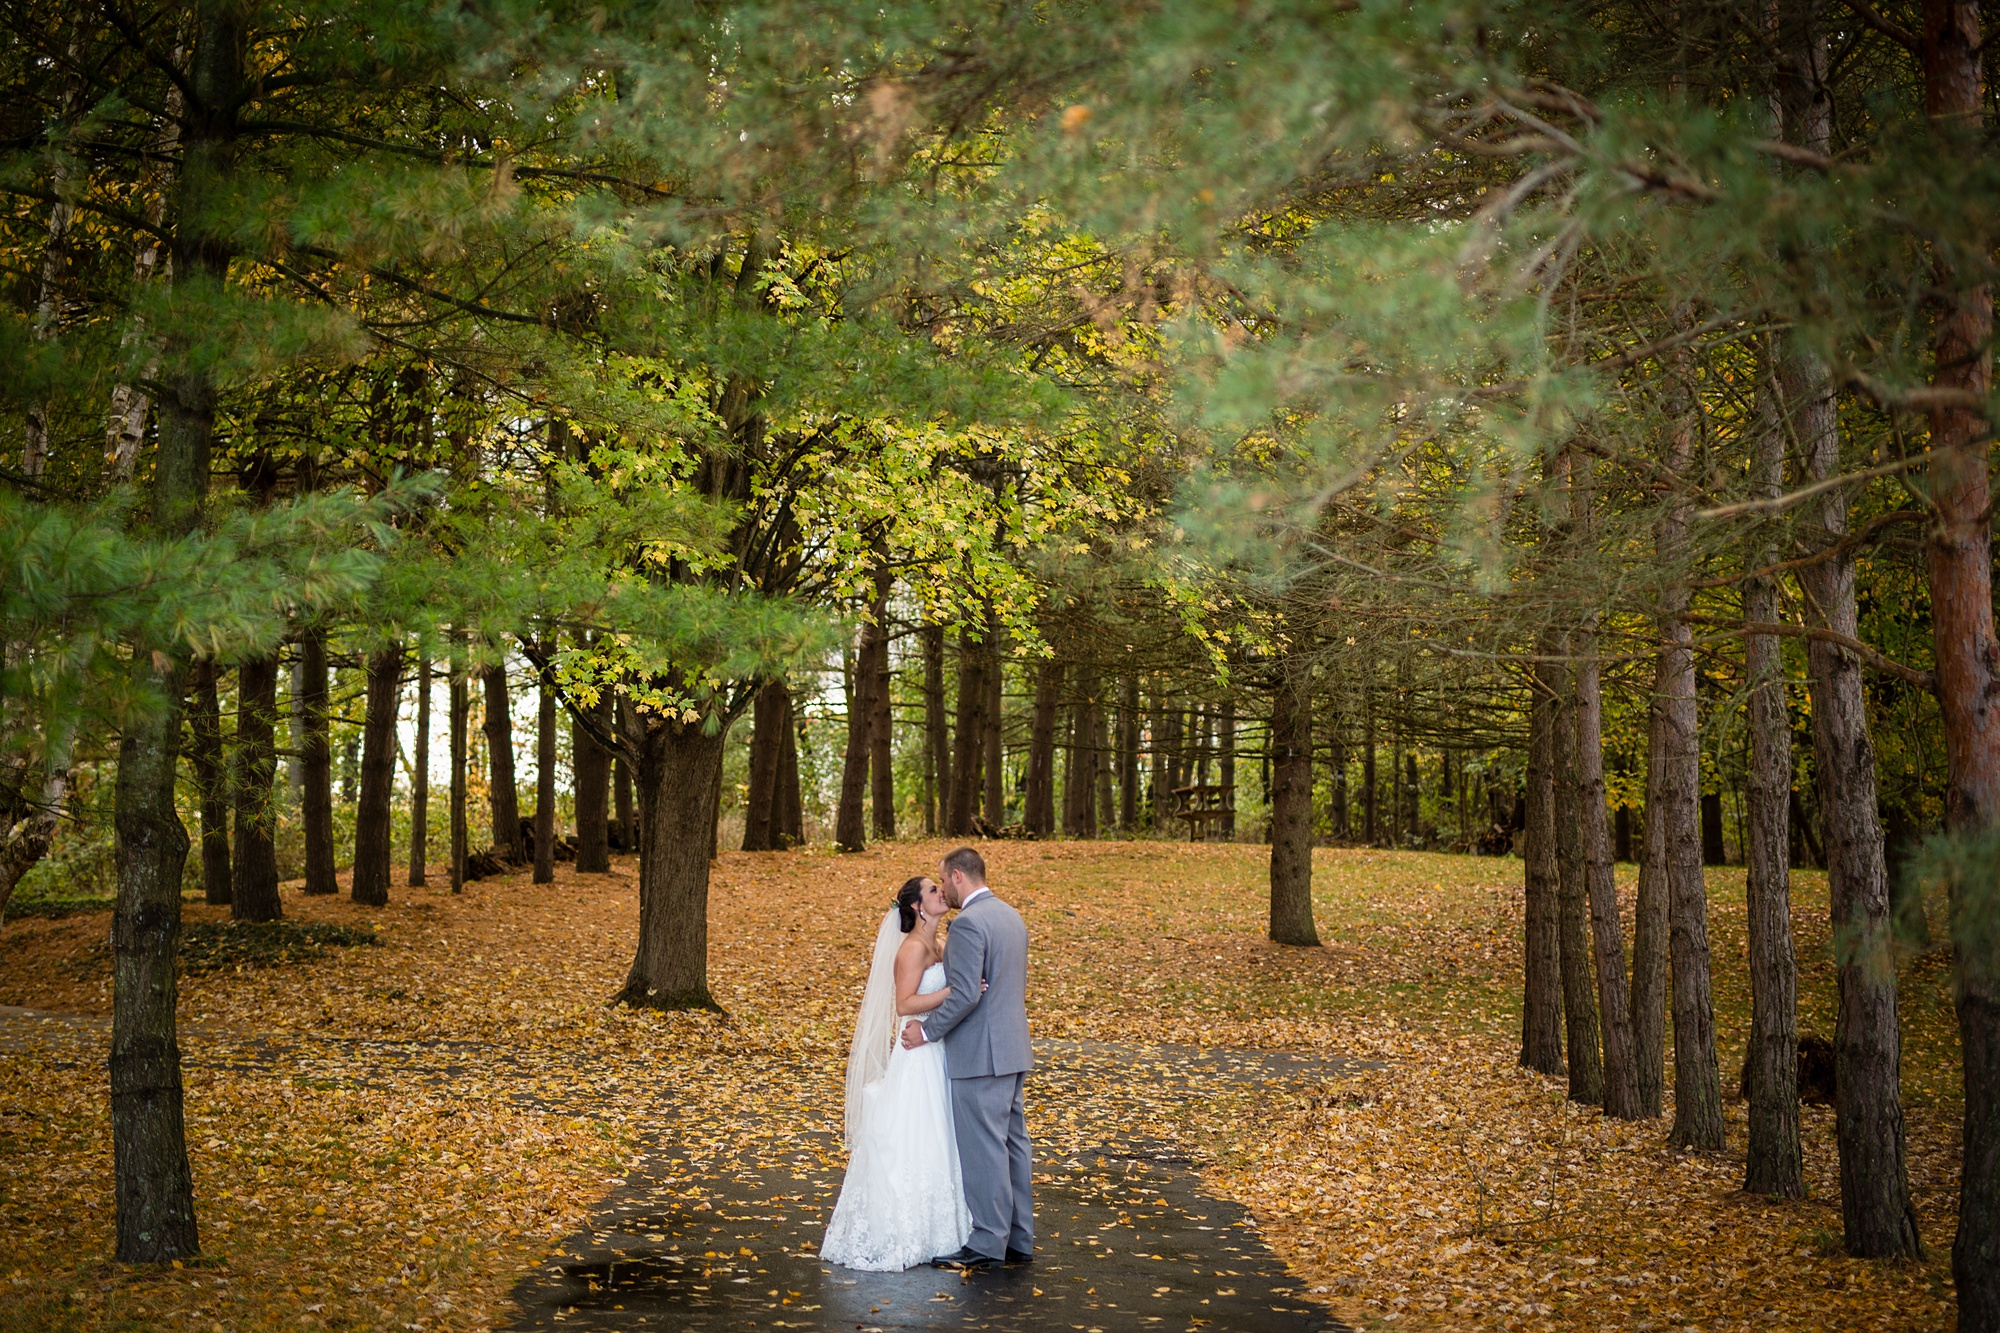 Brandon_Shafer_Photography_Emily_Travis_Kalamazoo_Wedding_Photography_0034.jpg